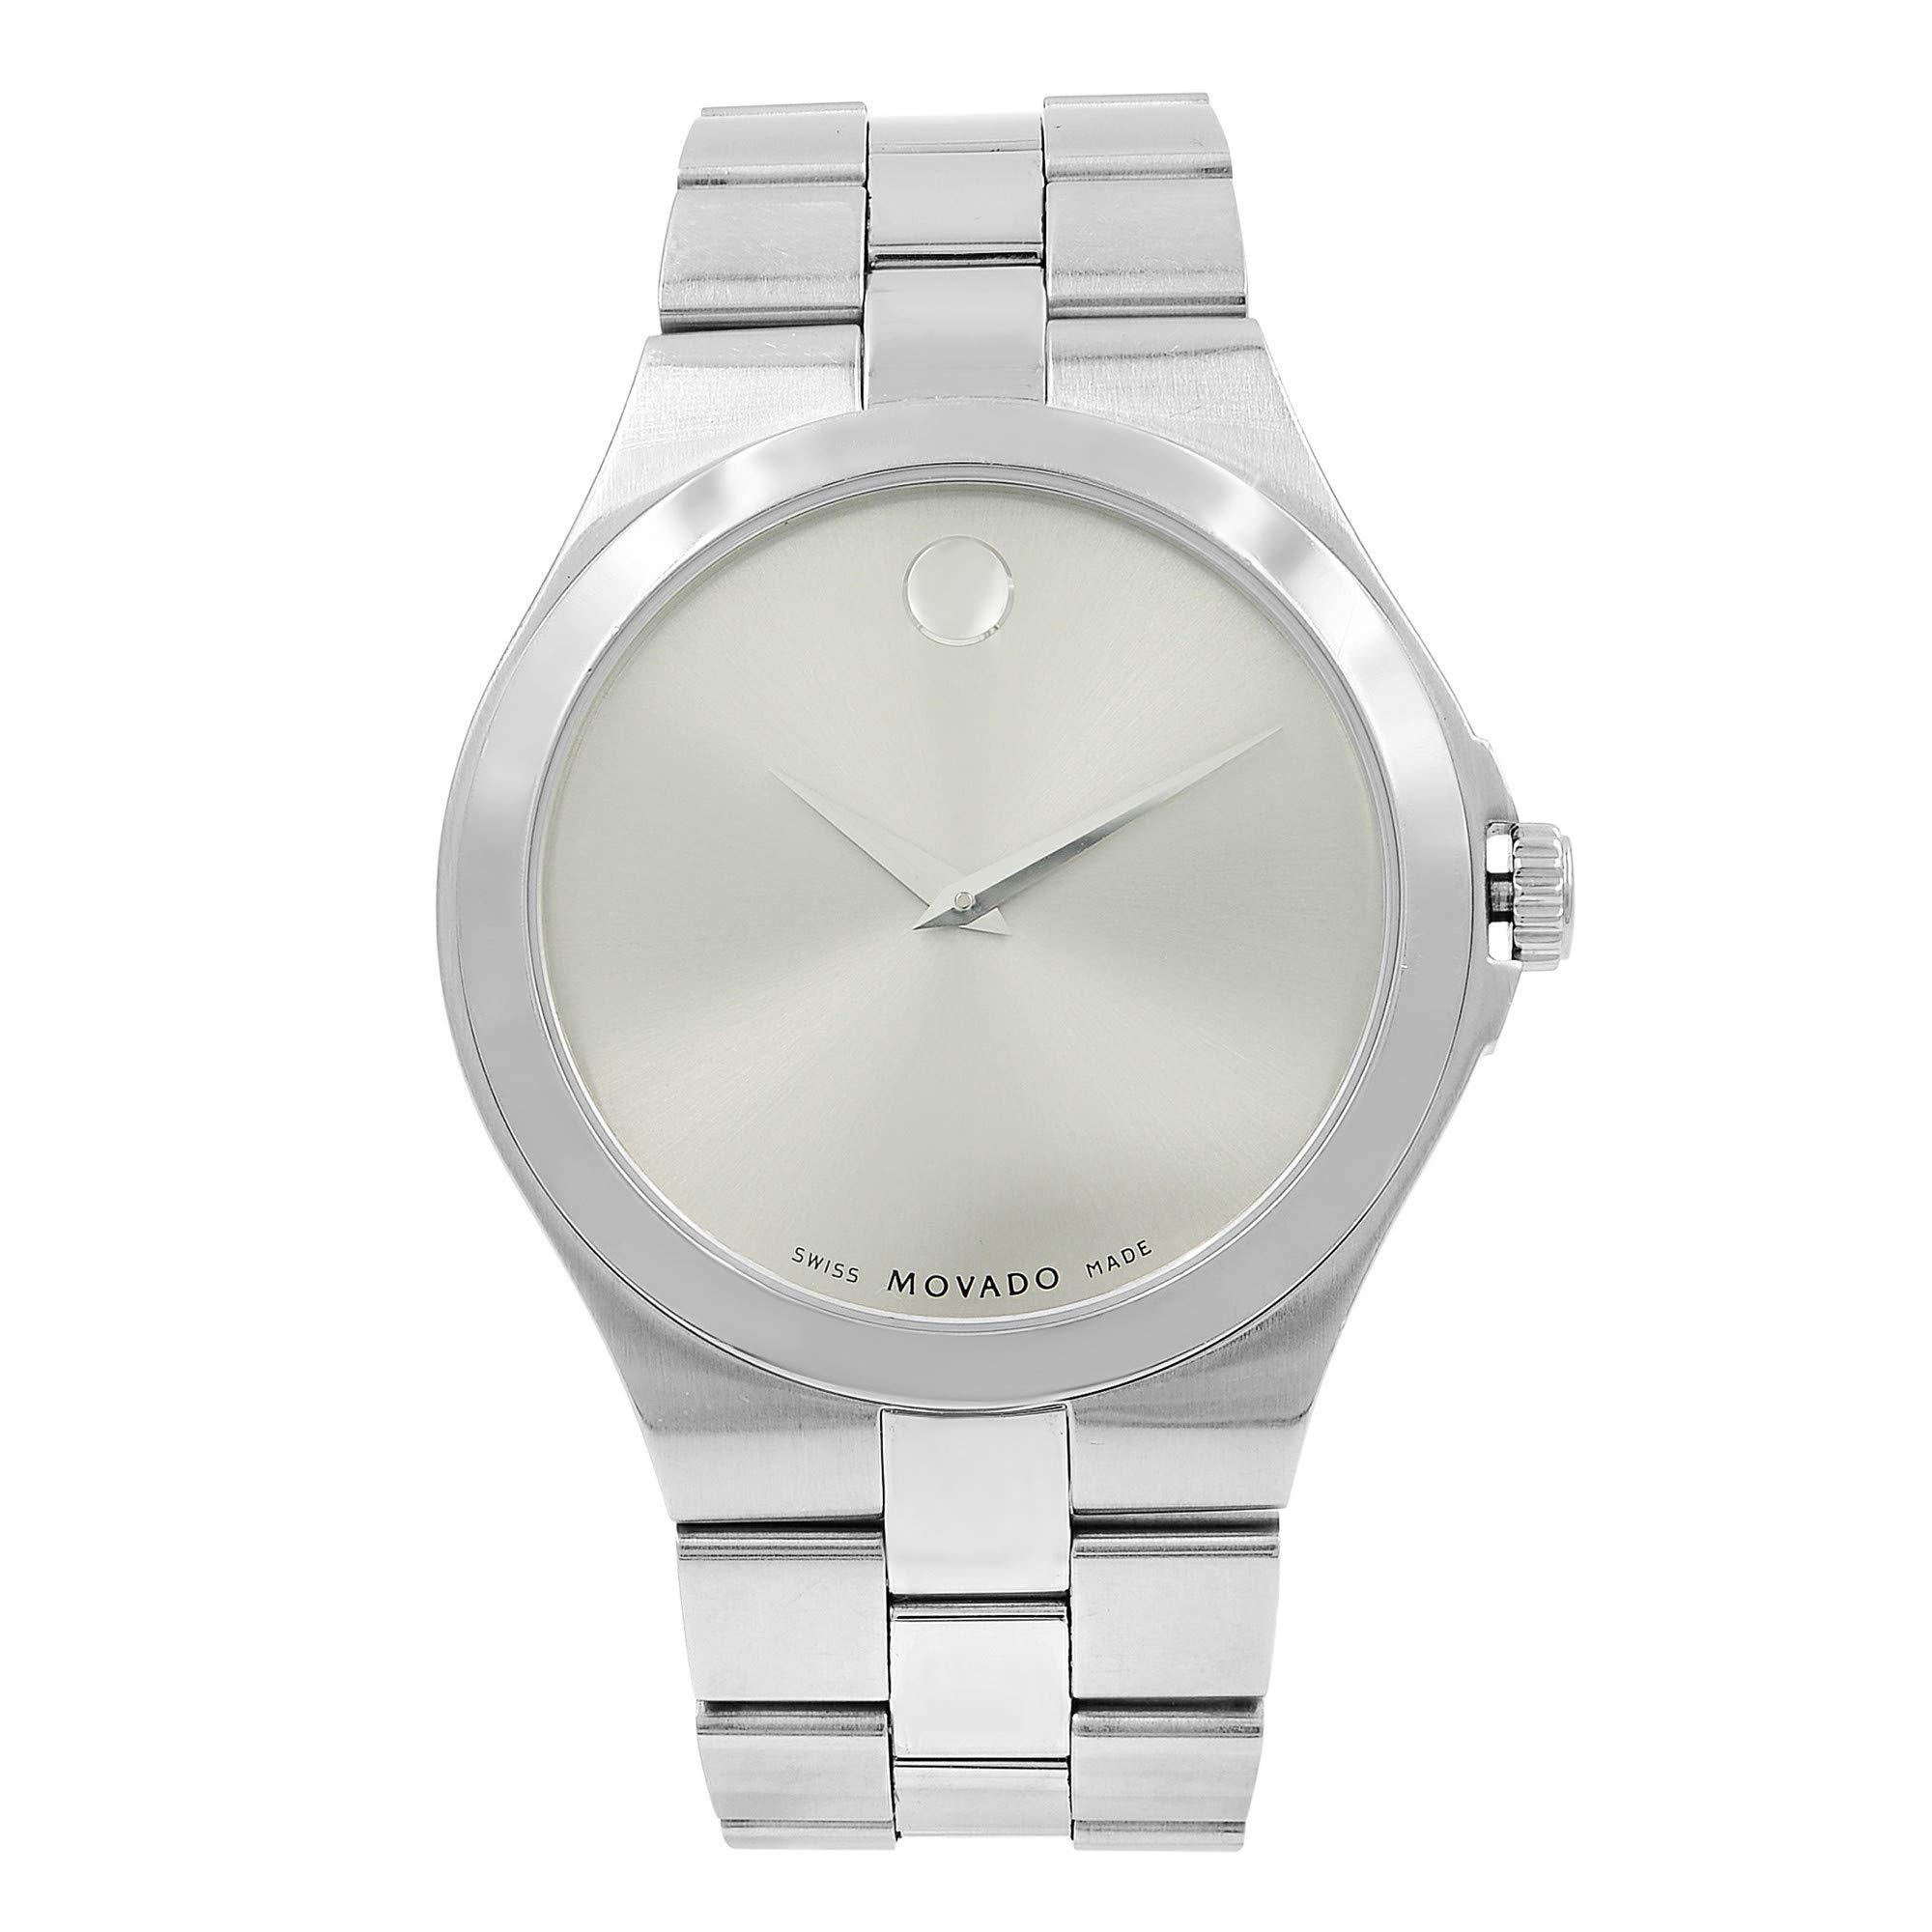 Movado Serio Quartz Male Watch 0606556 (Certified Pre-Owned) by Movado